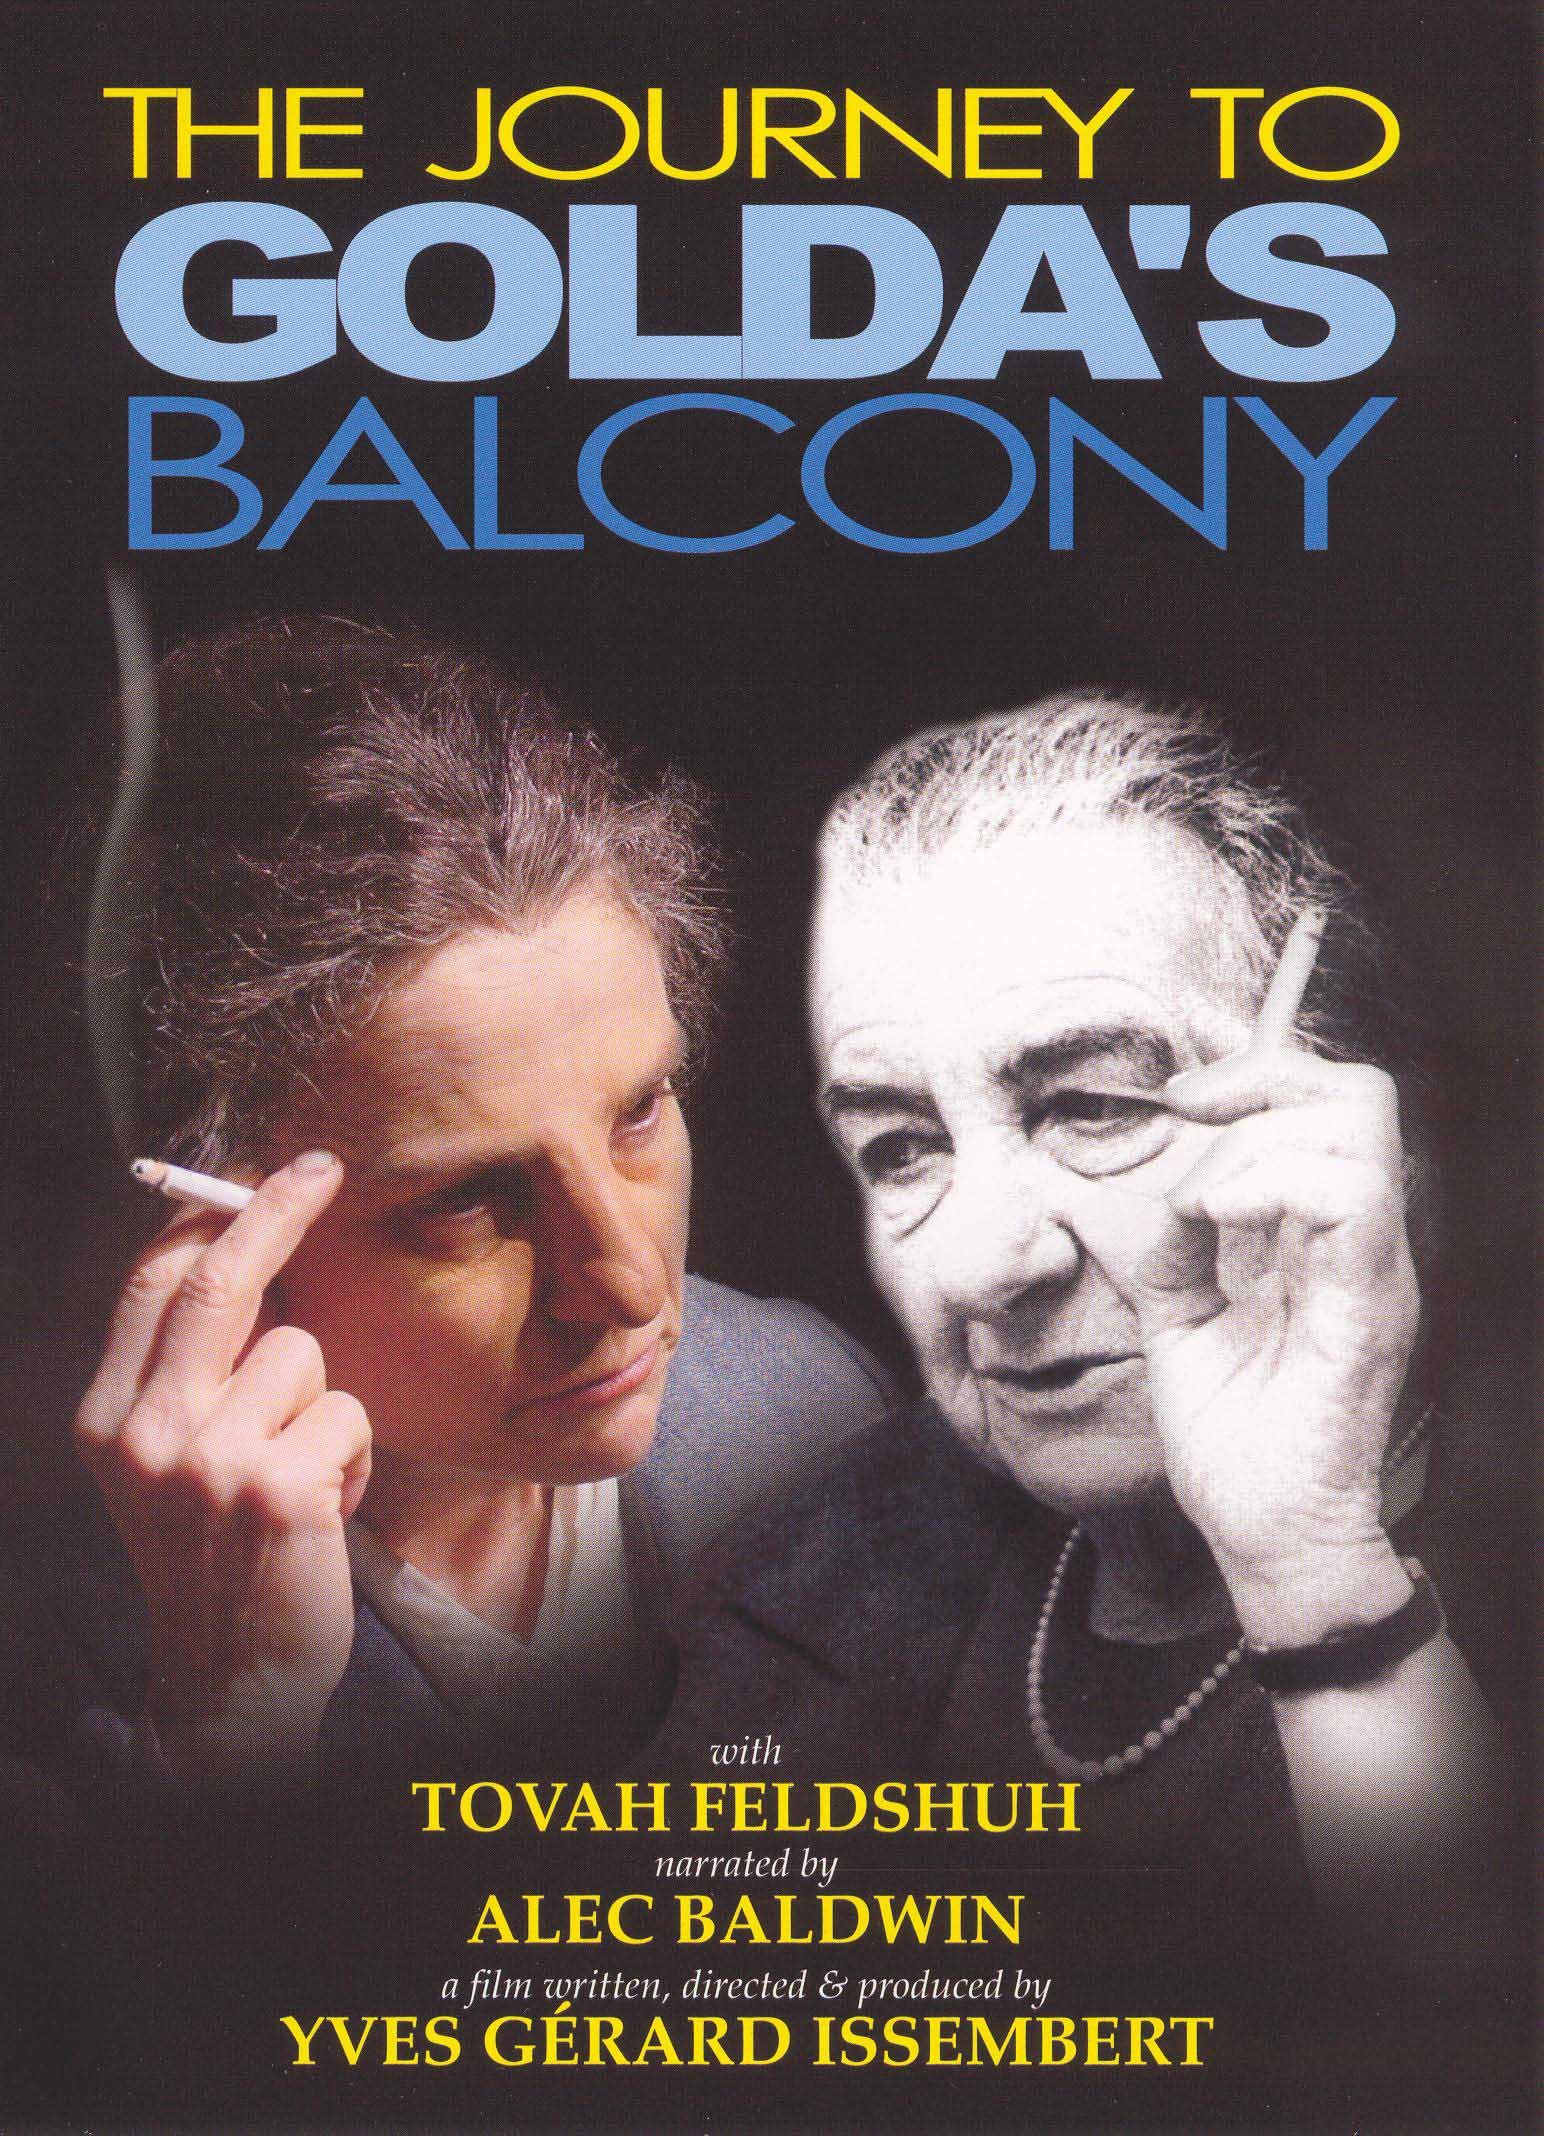 The Journey to Golda's Balcony